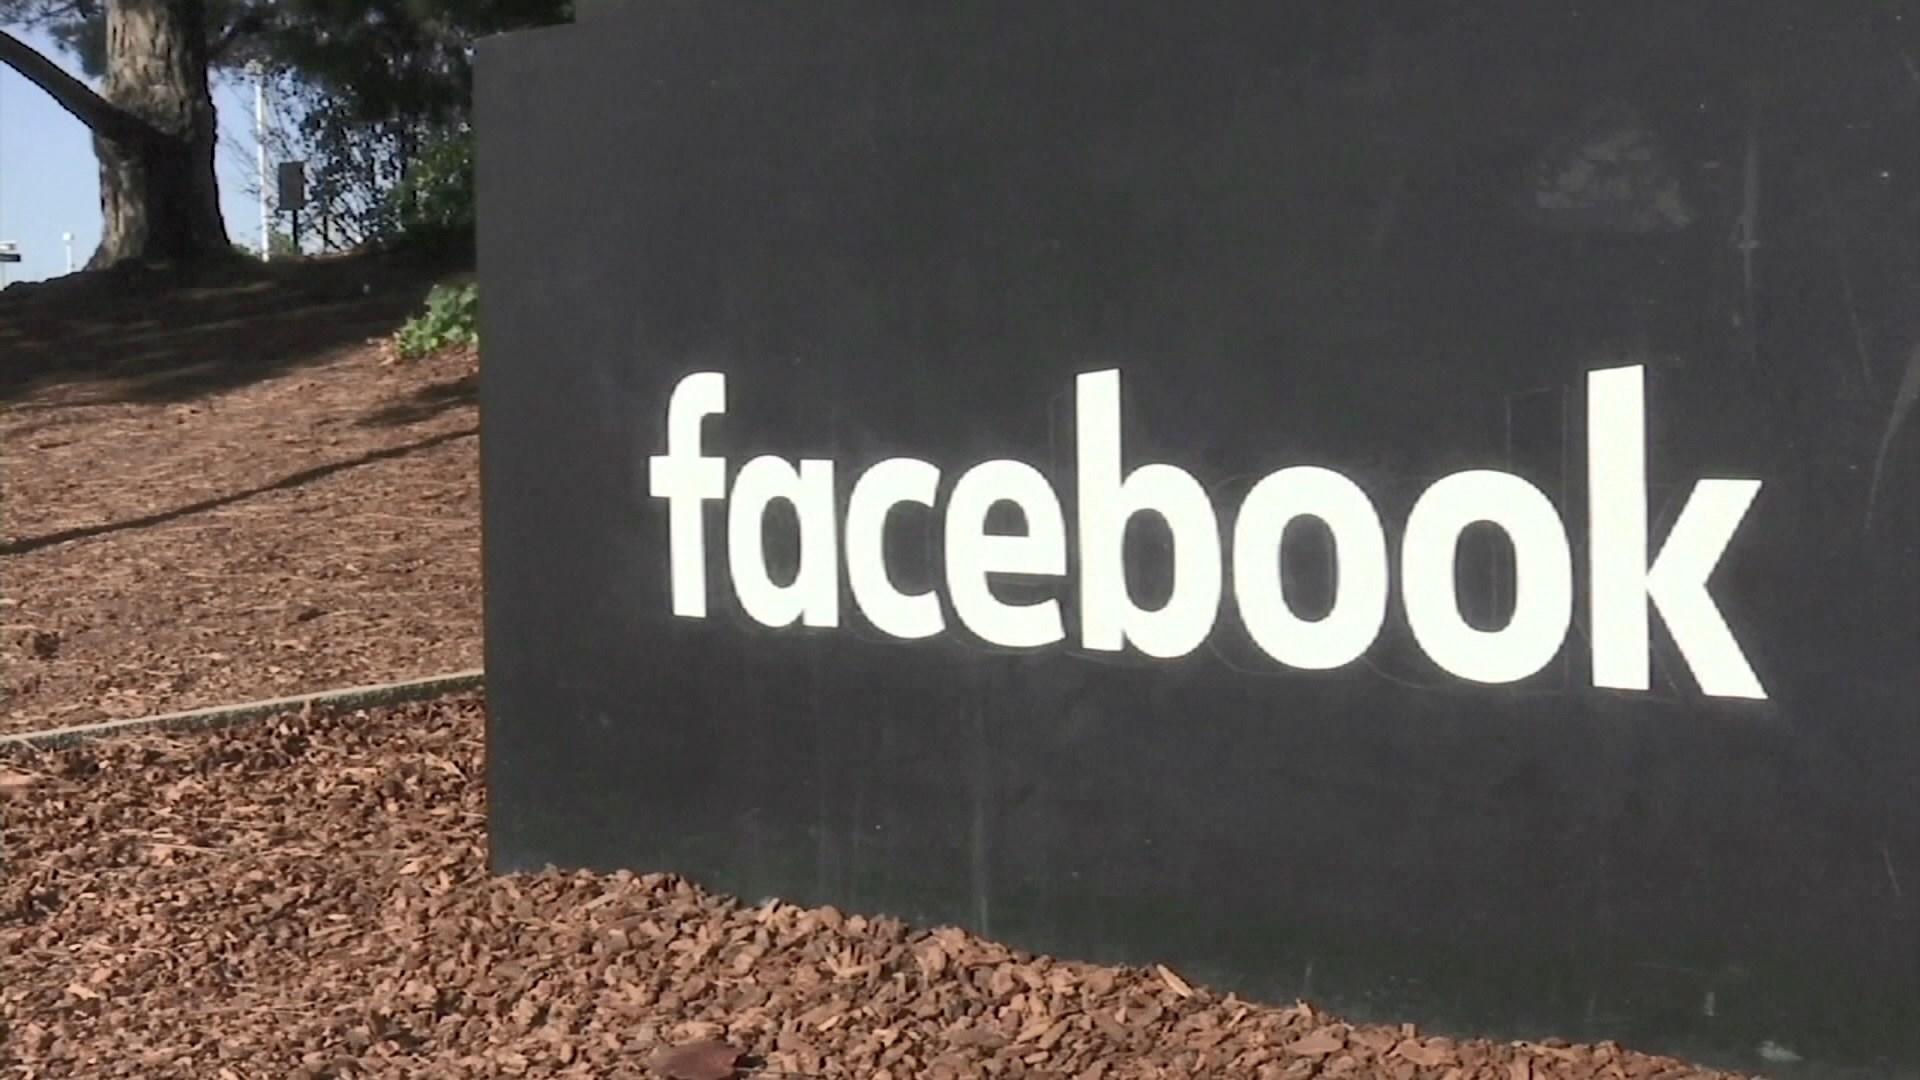 FB刪除多個俄羅斯和伊朗問題帳戶